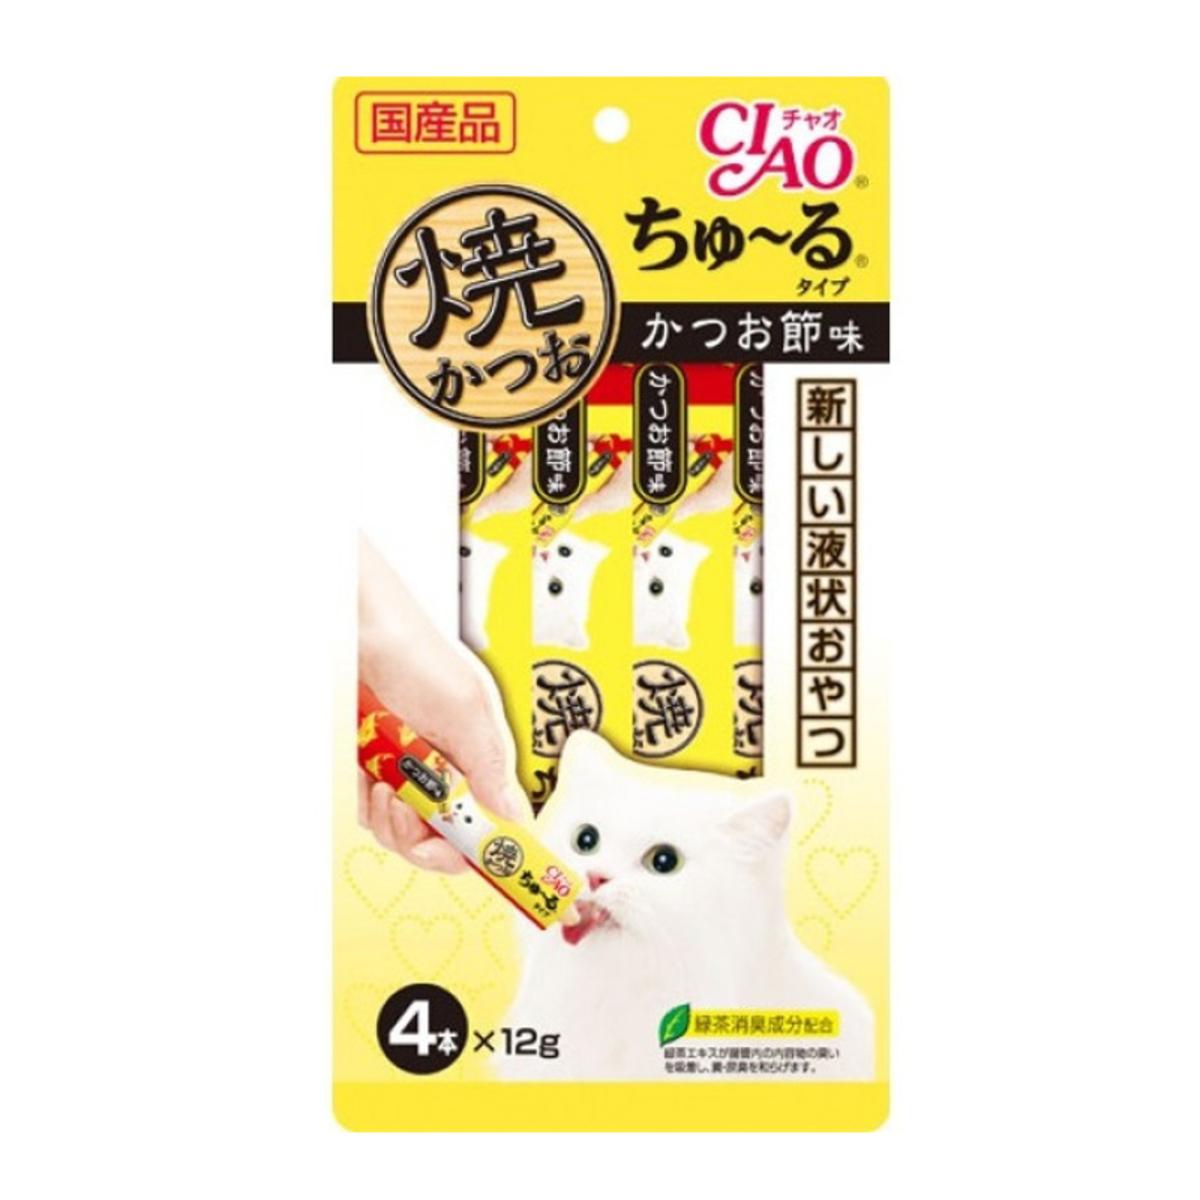 Ciao Grilled Tuna Churu Dried Bonito Flavor 12g x4p